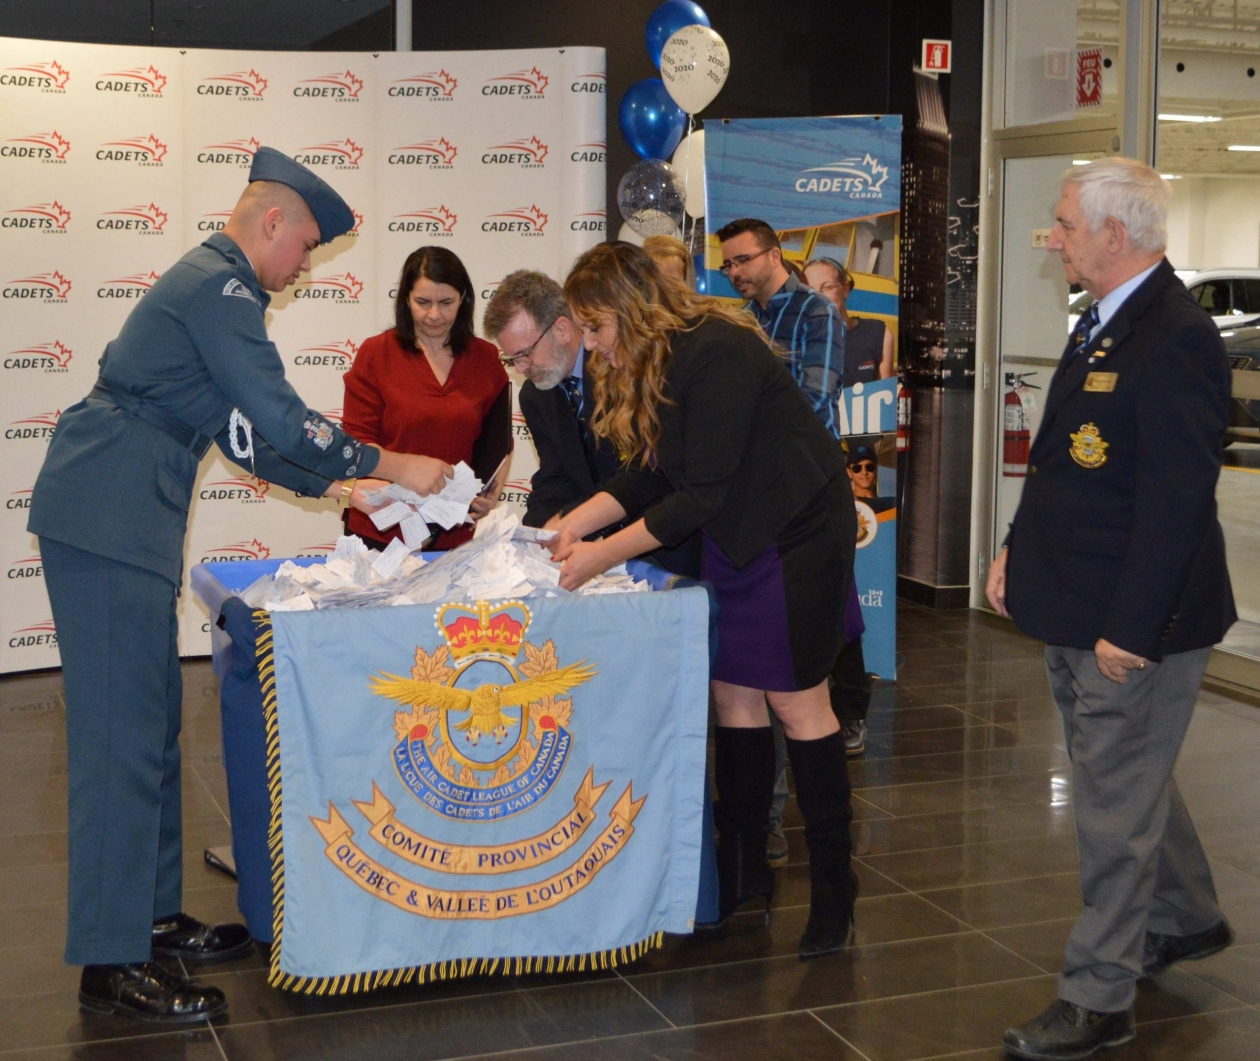 Image L'Auto-cadet 2019-2020 – Fundraising campaign